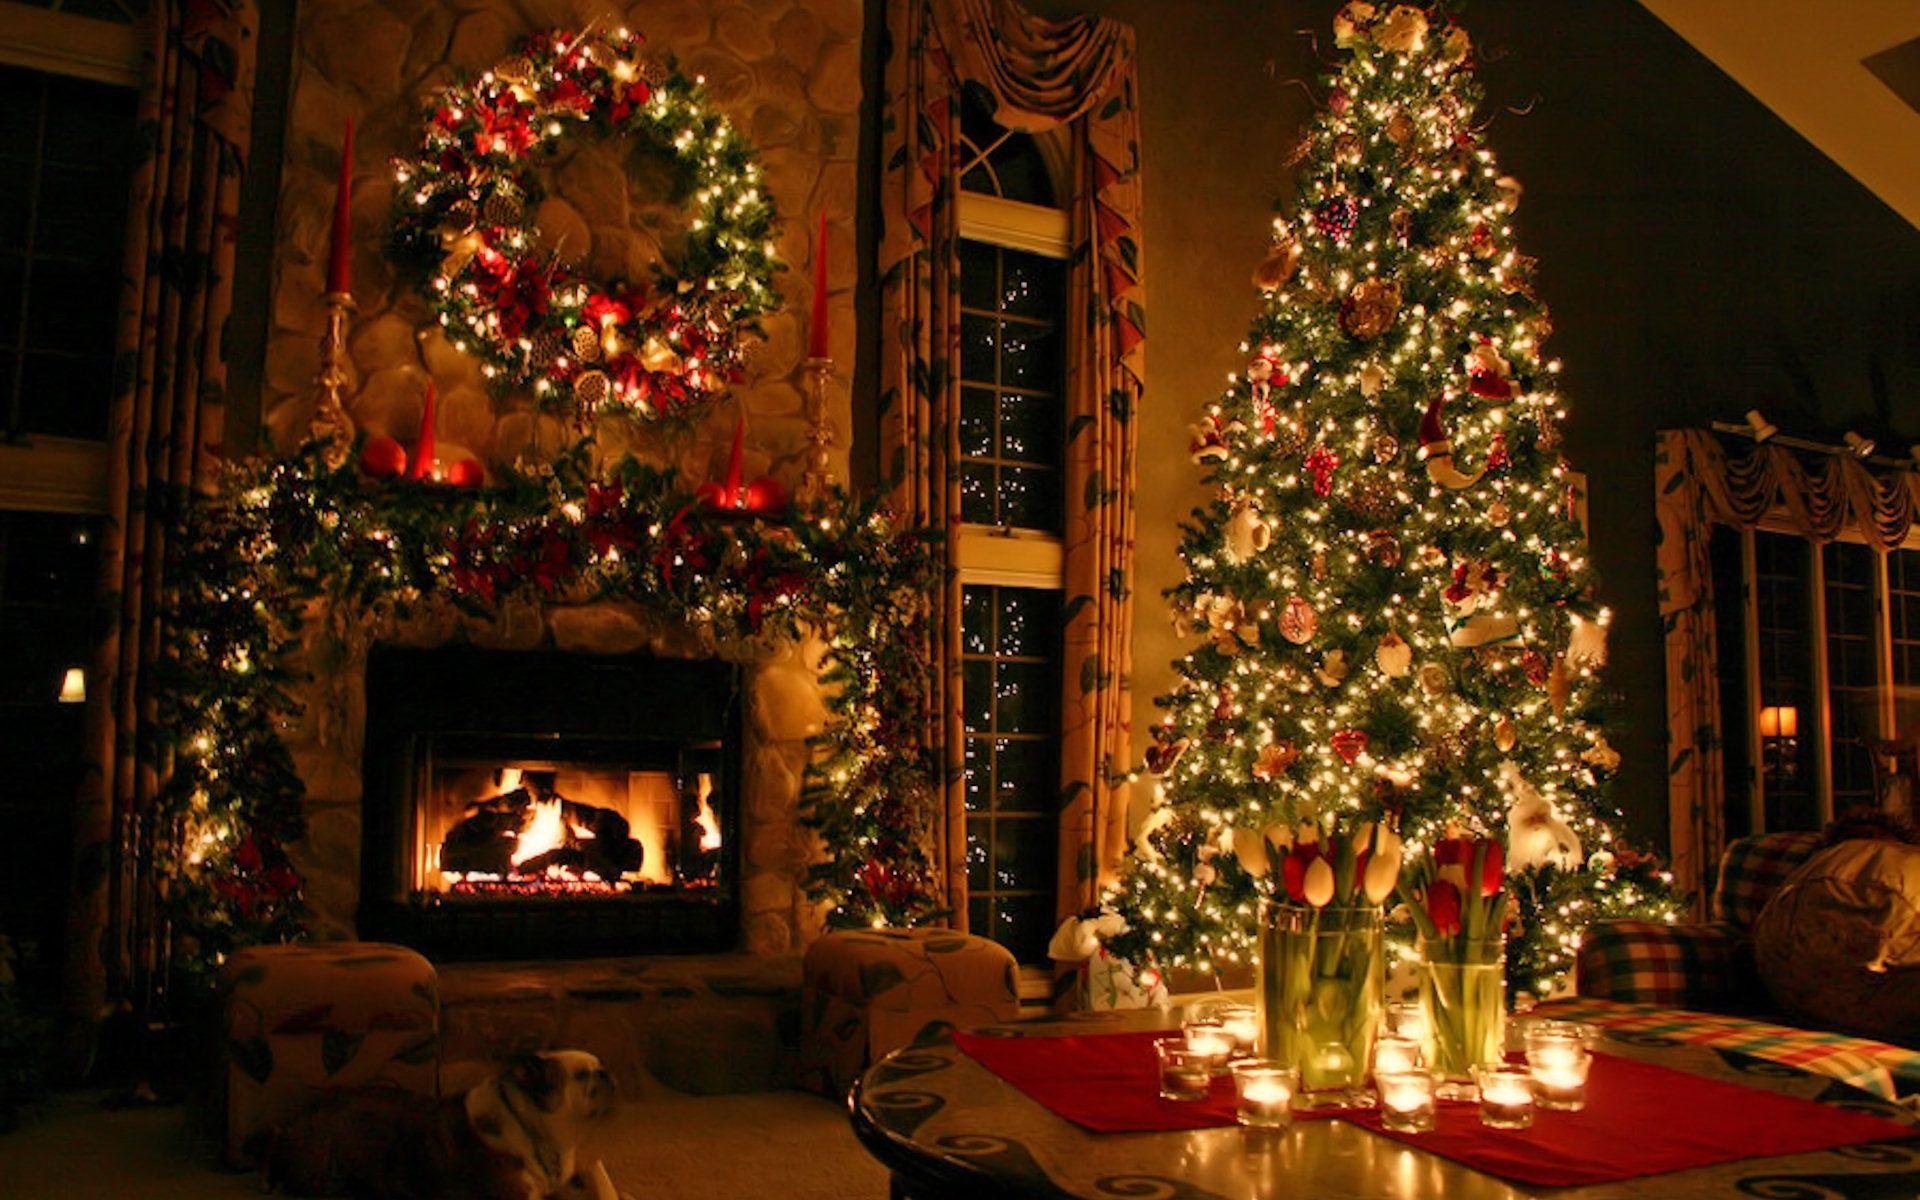 21 Stunningly Beautiful Christmas Desktop Wallpapers Web Design Mash Christmas Desktop Christmas Fireplace Beautiful Christmas Trees